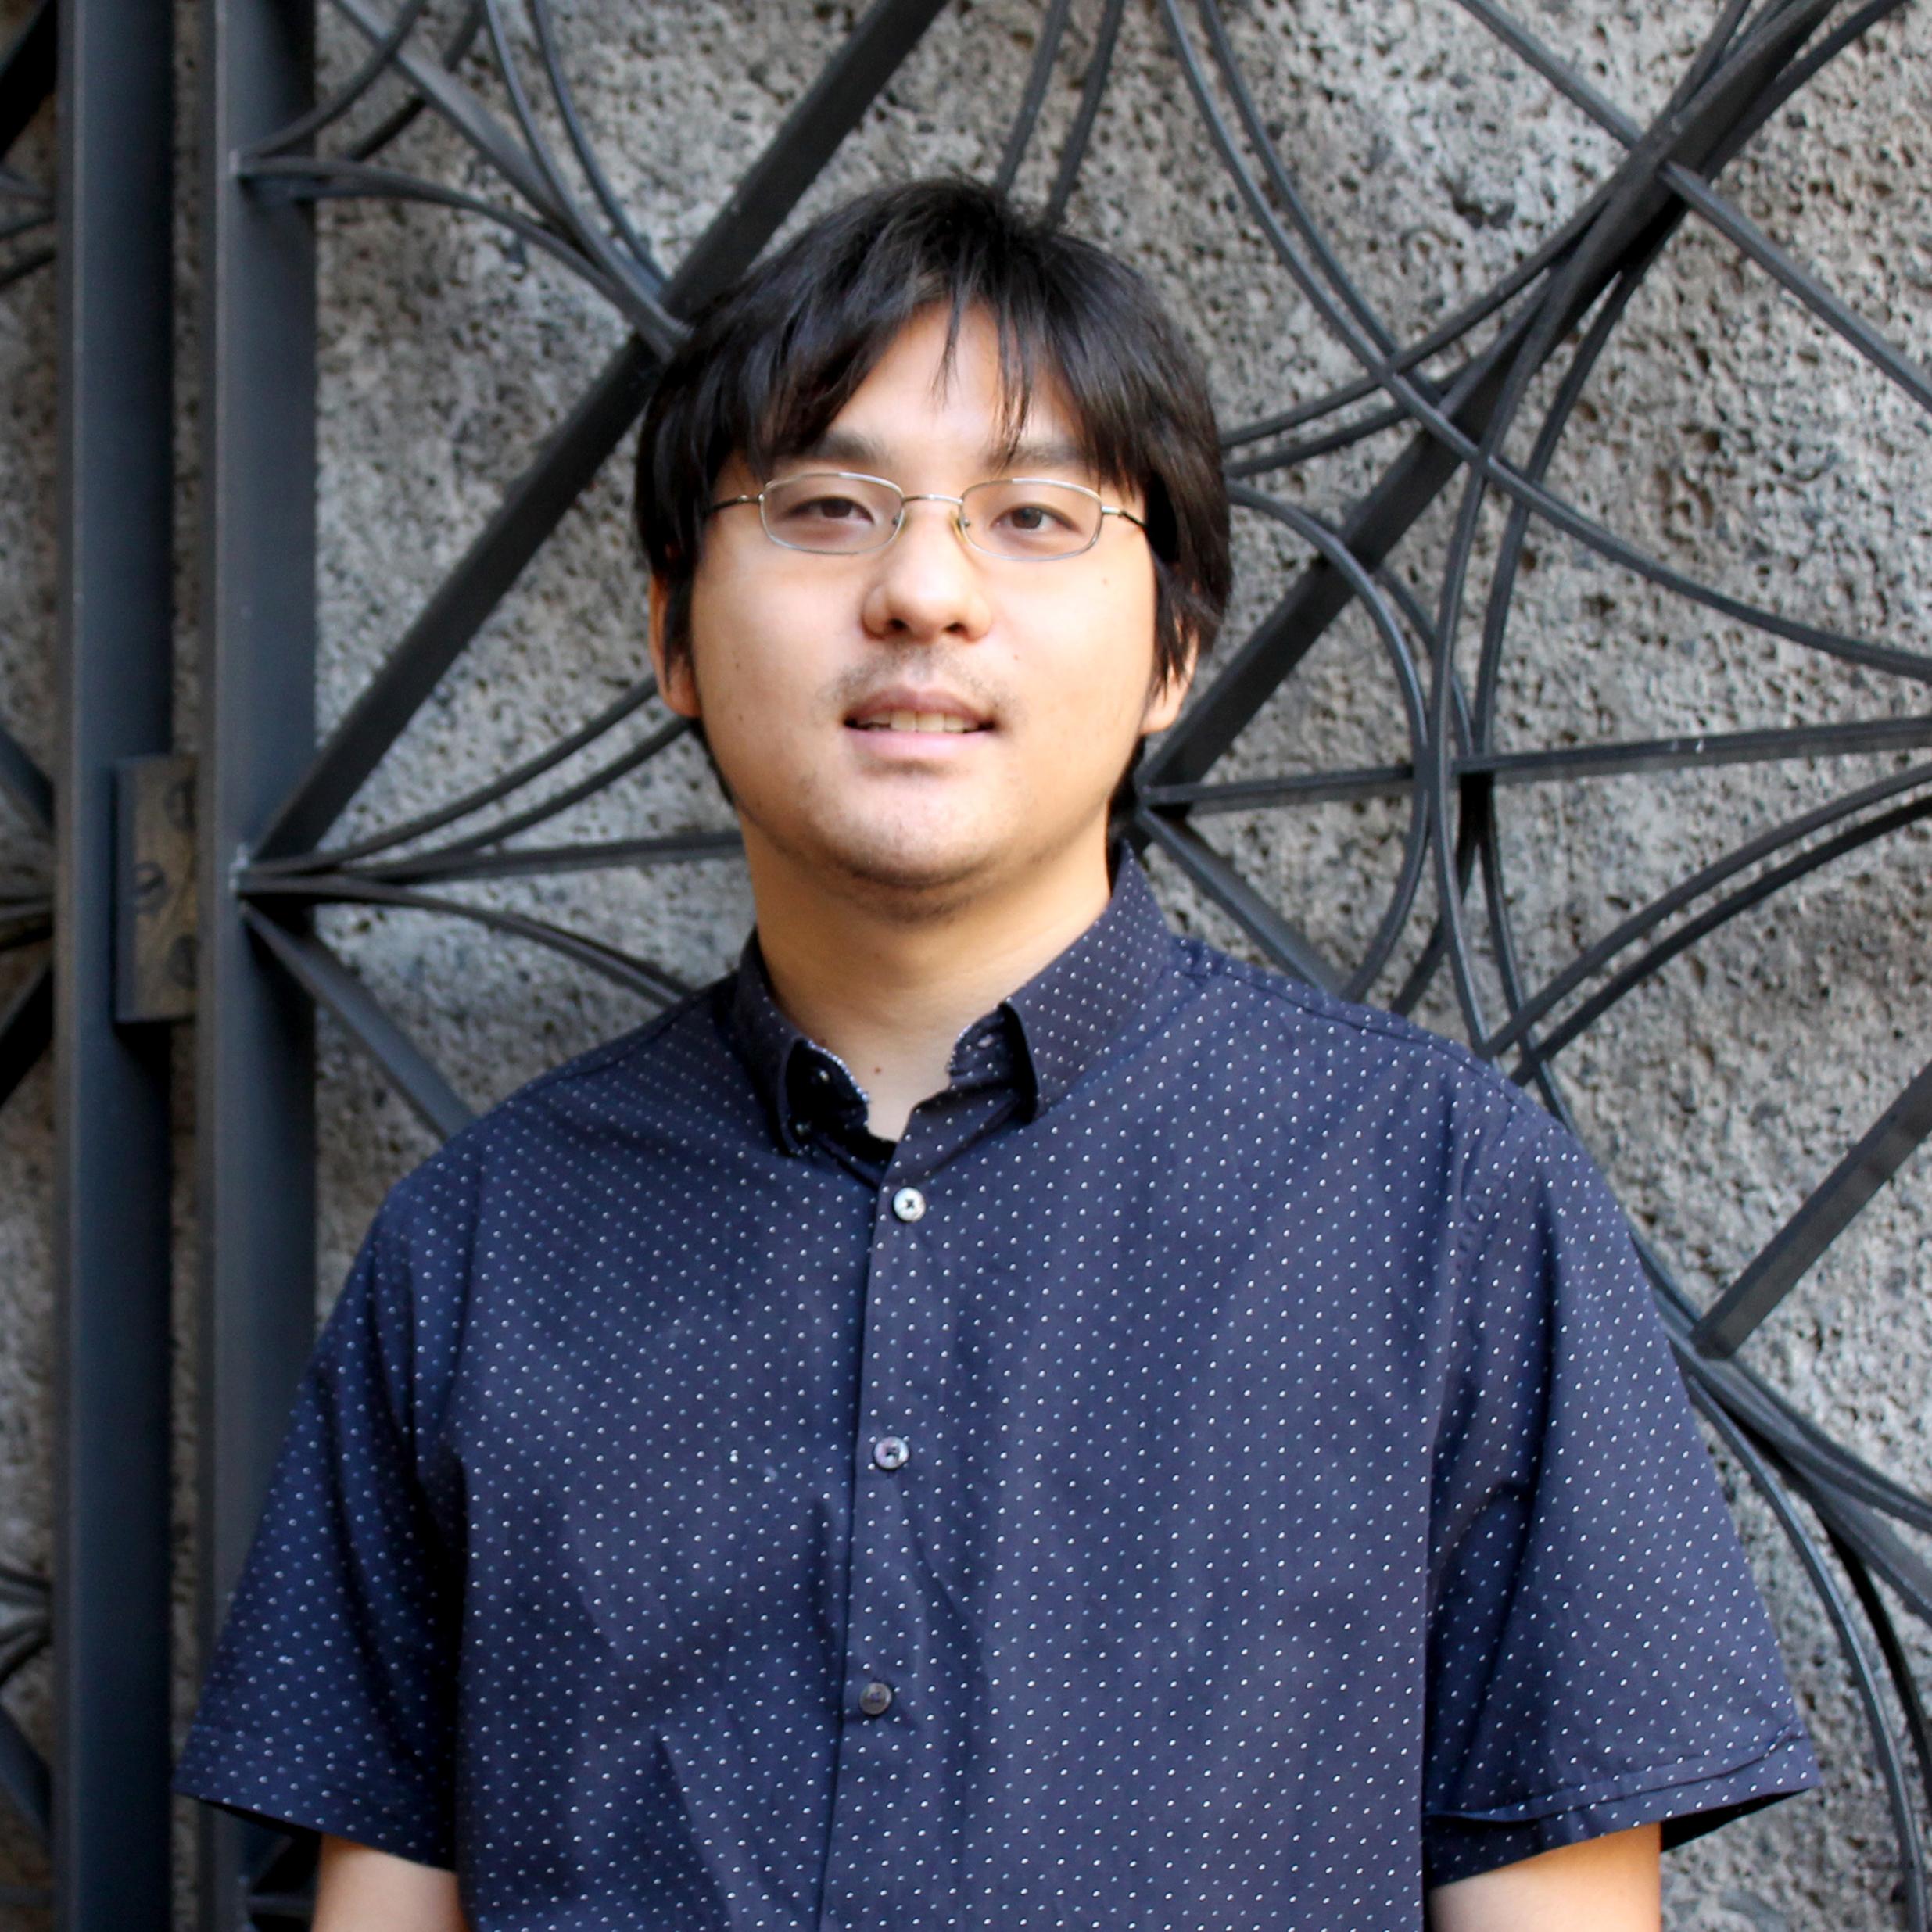 Rayshi Hong